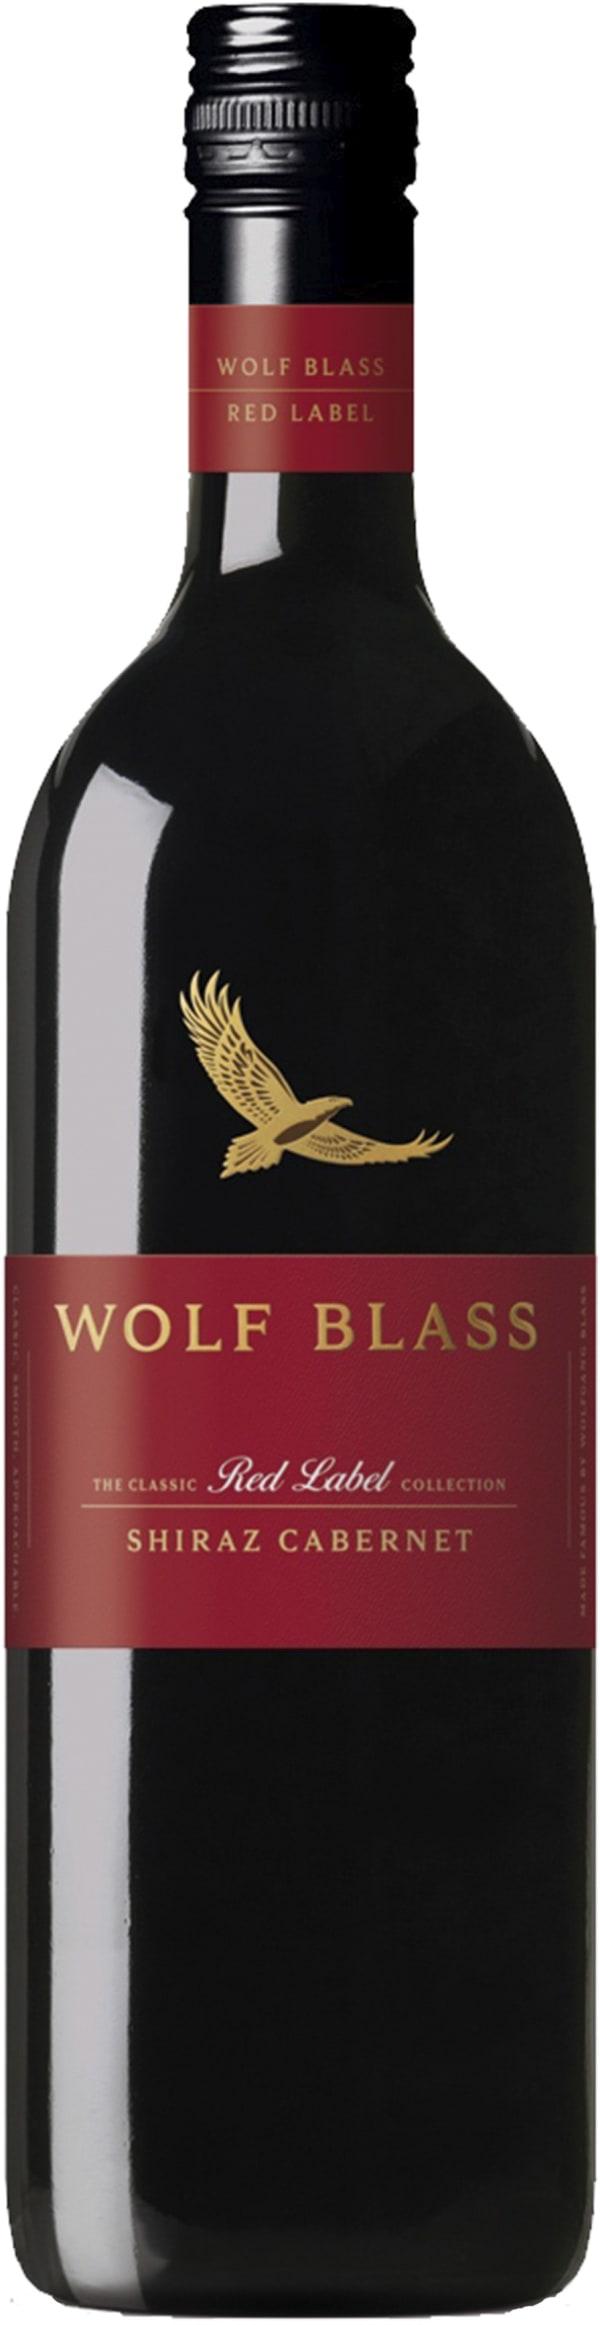 Wolf Blass Red Label Shiraz Cabernet  2018